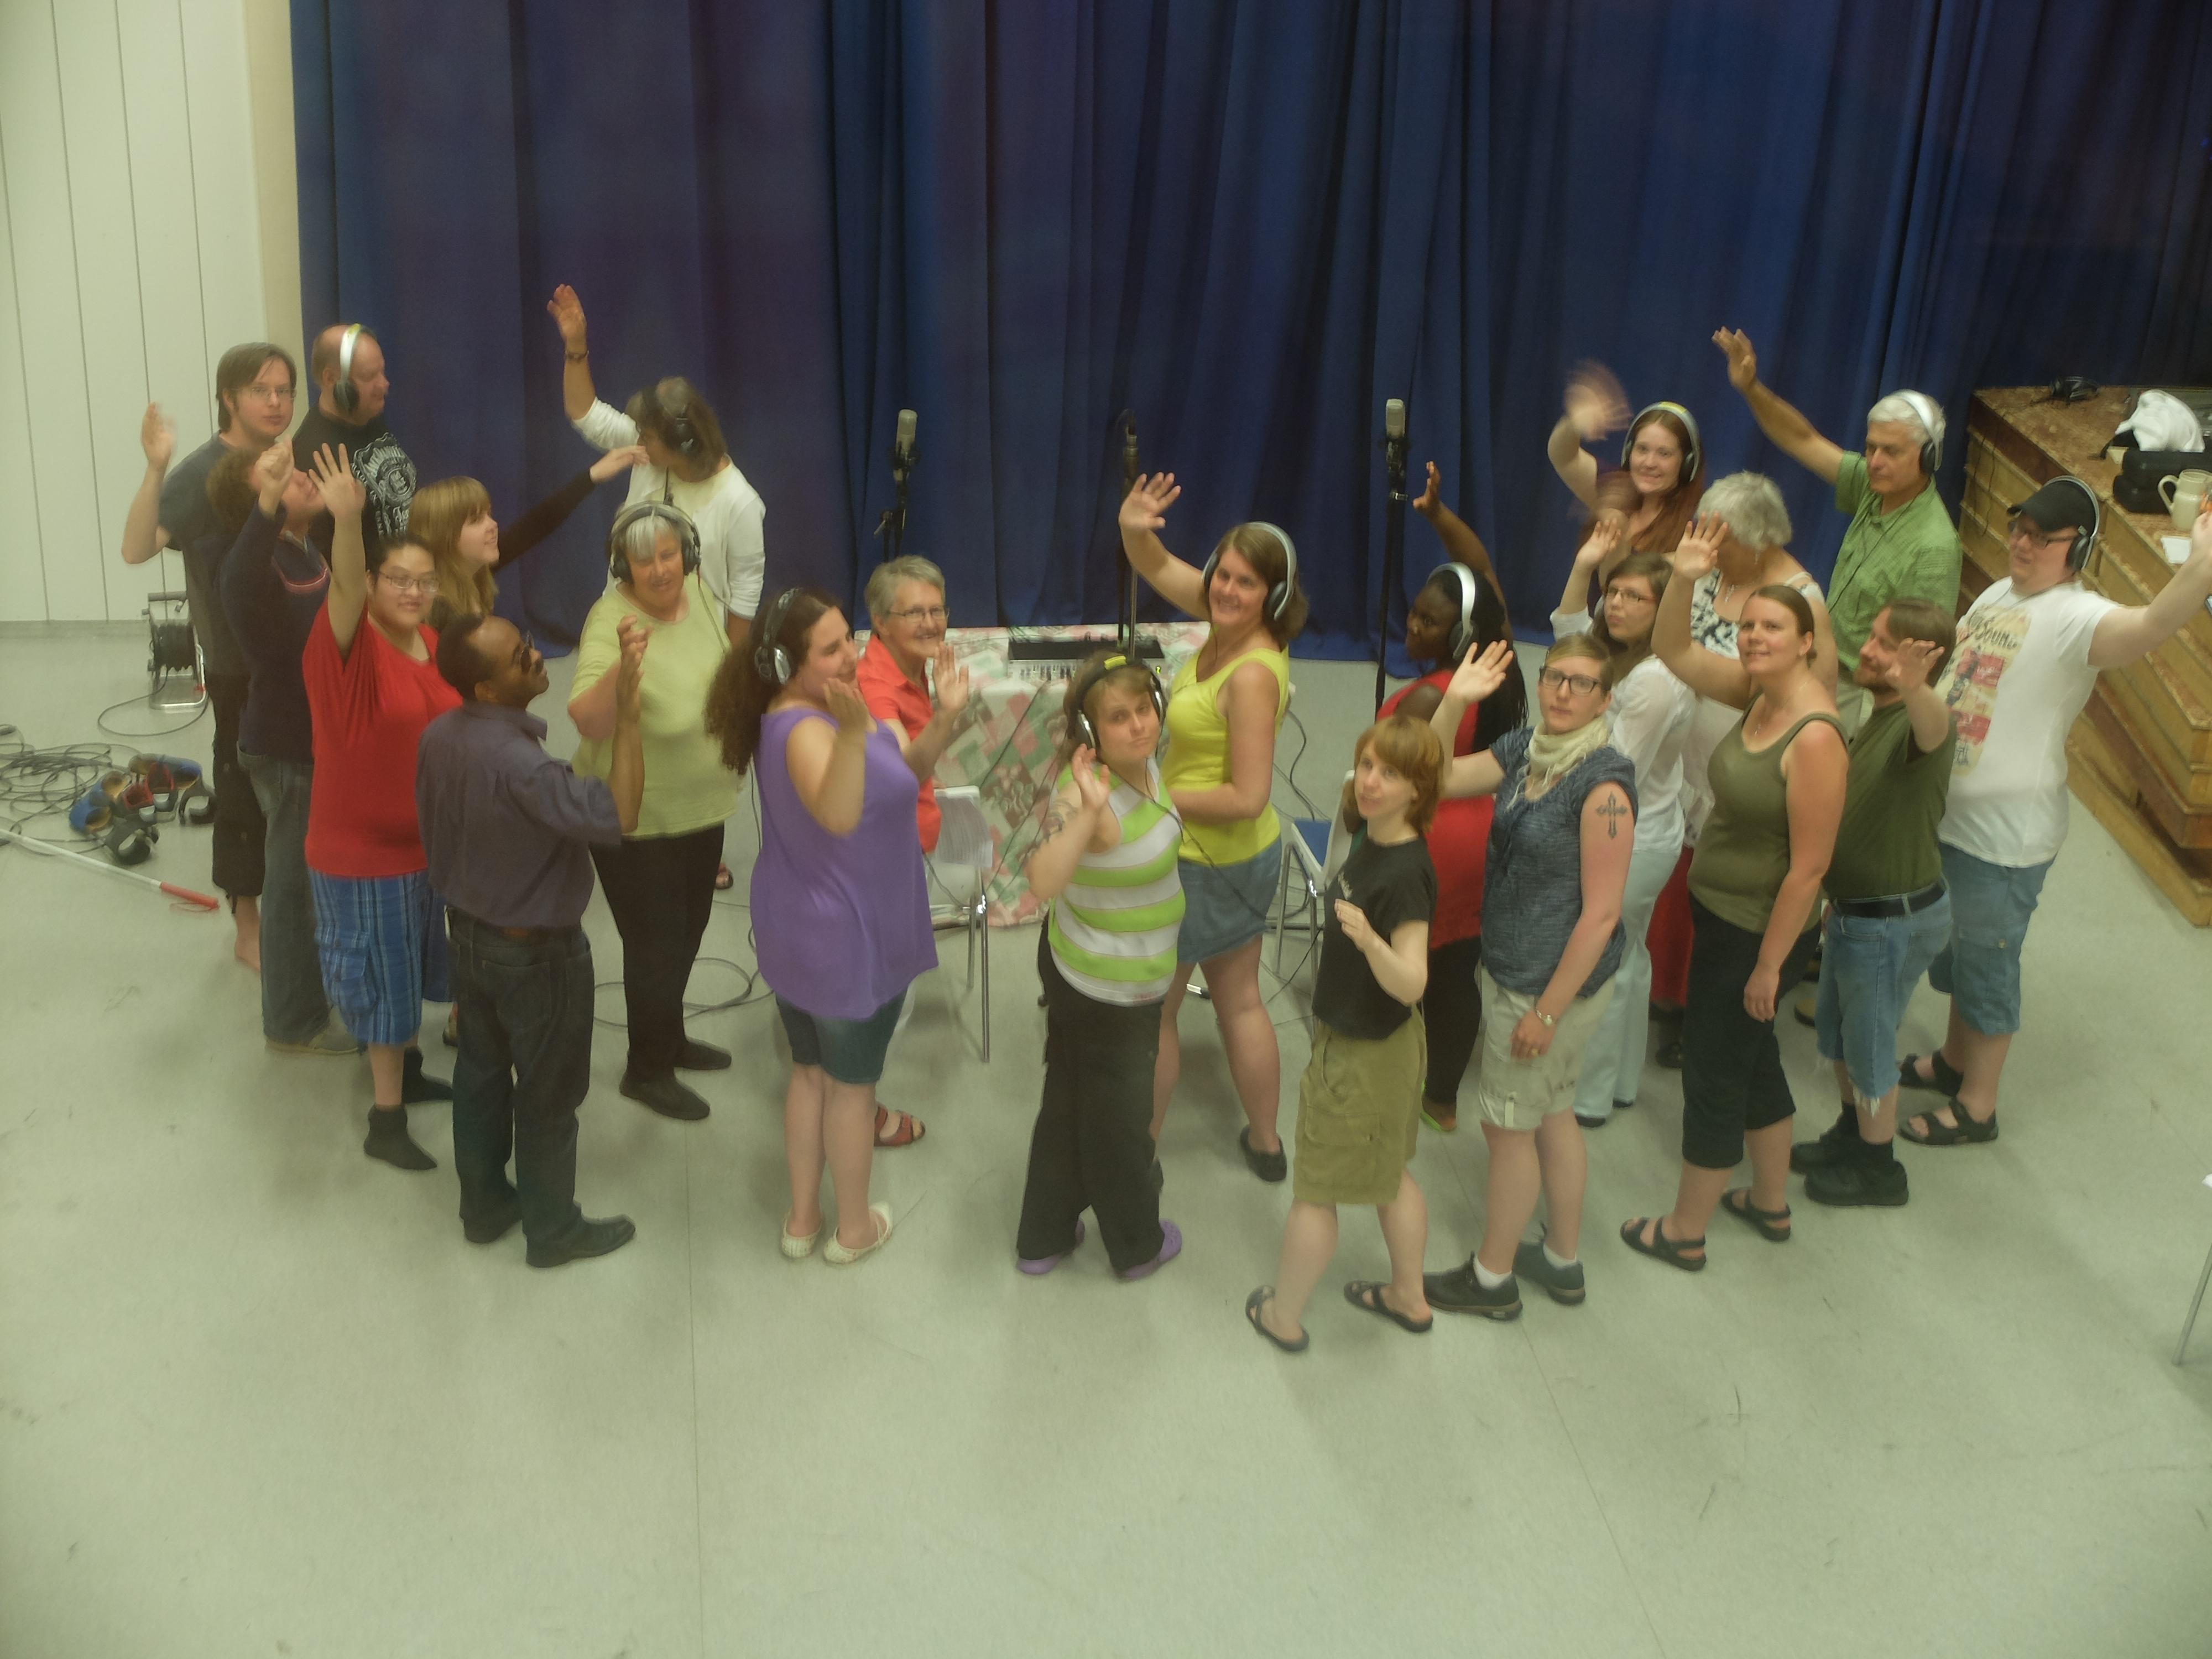 byrå ledsagare dansa nära örebro